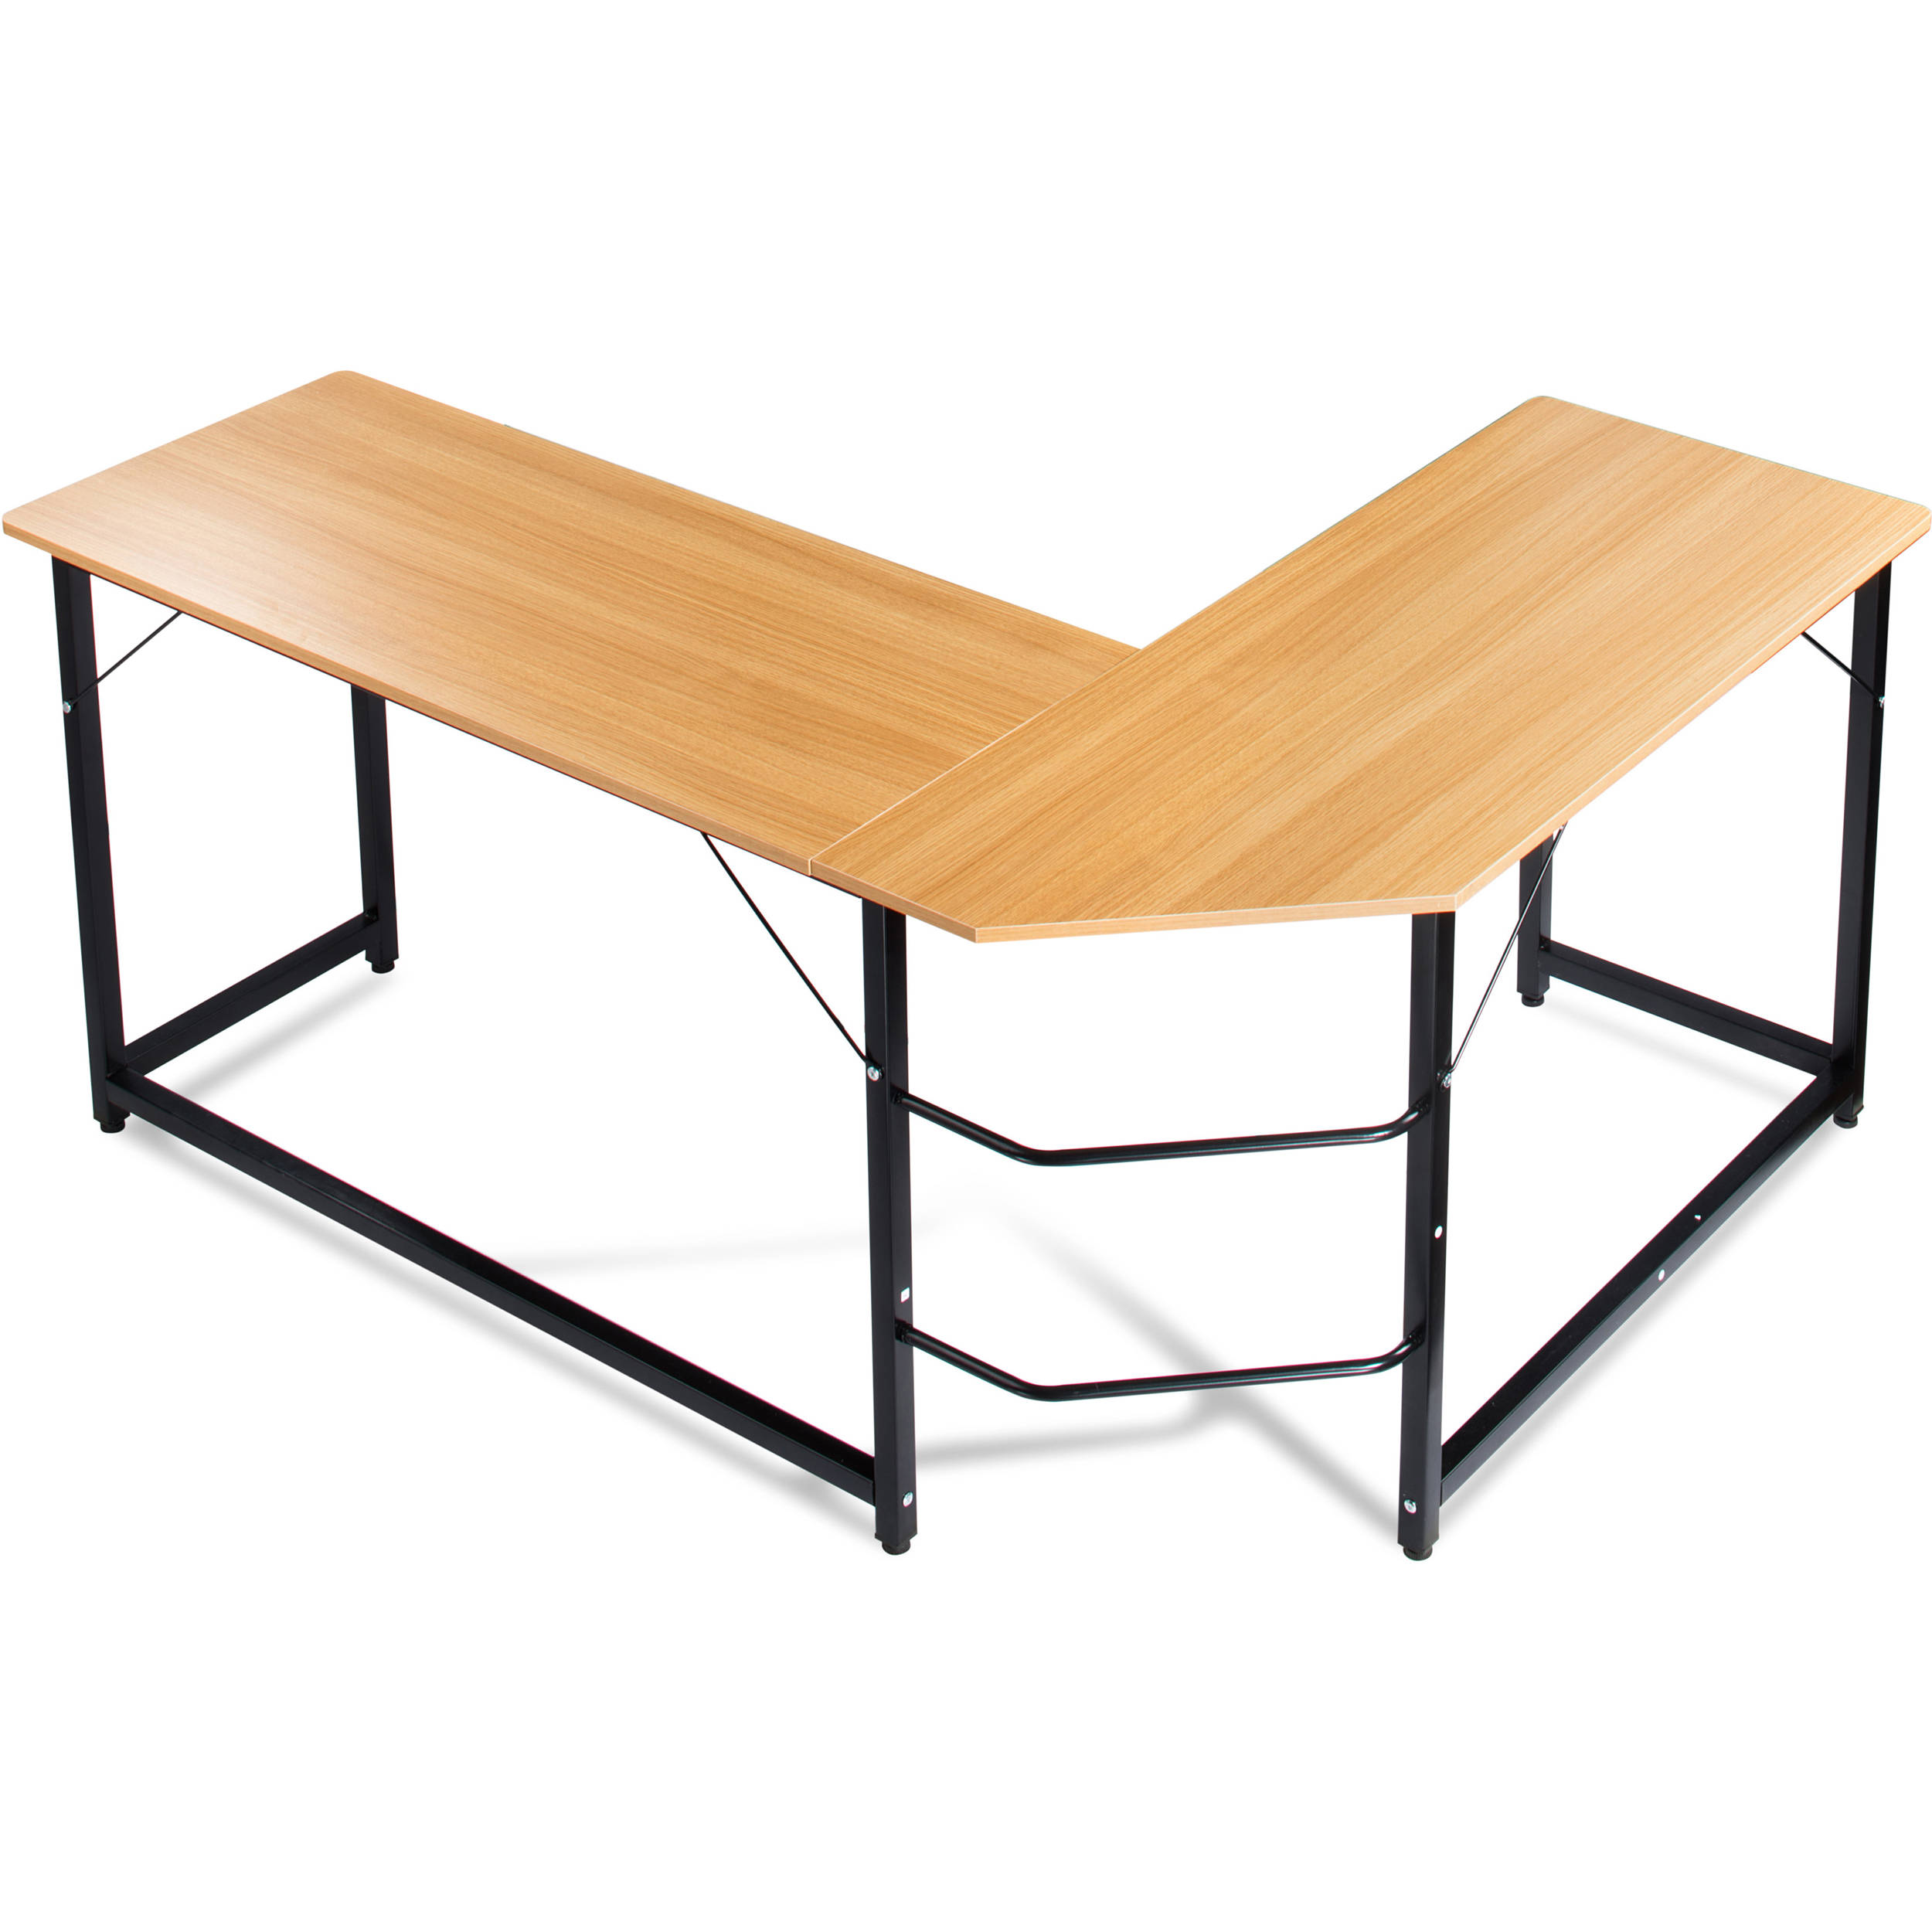 luxxetta l shaped office computer desk bf cd10beg b h photo. Black Bedroom Furniture Sets. Home Design Ideas